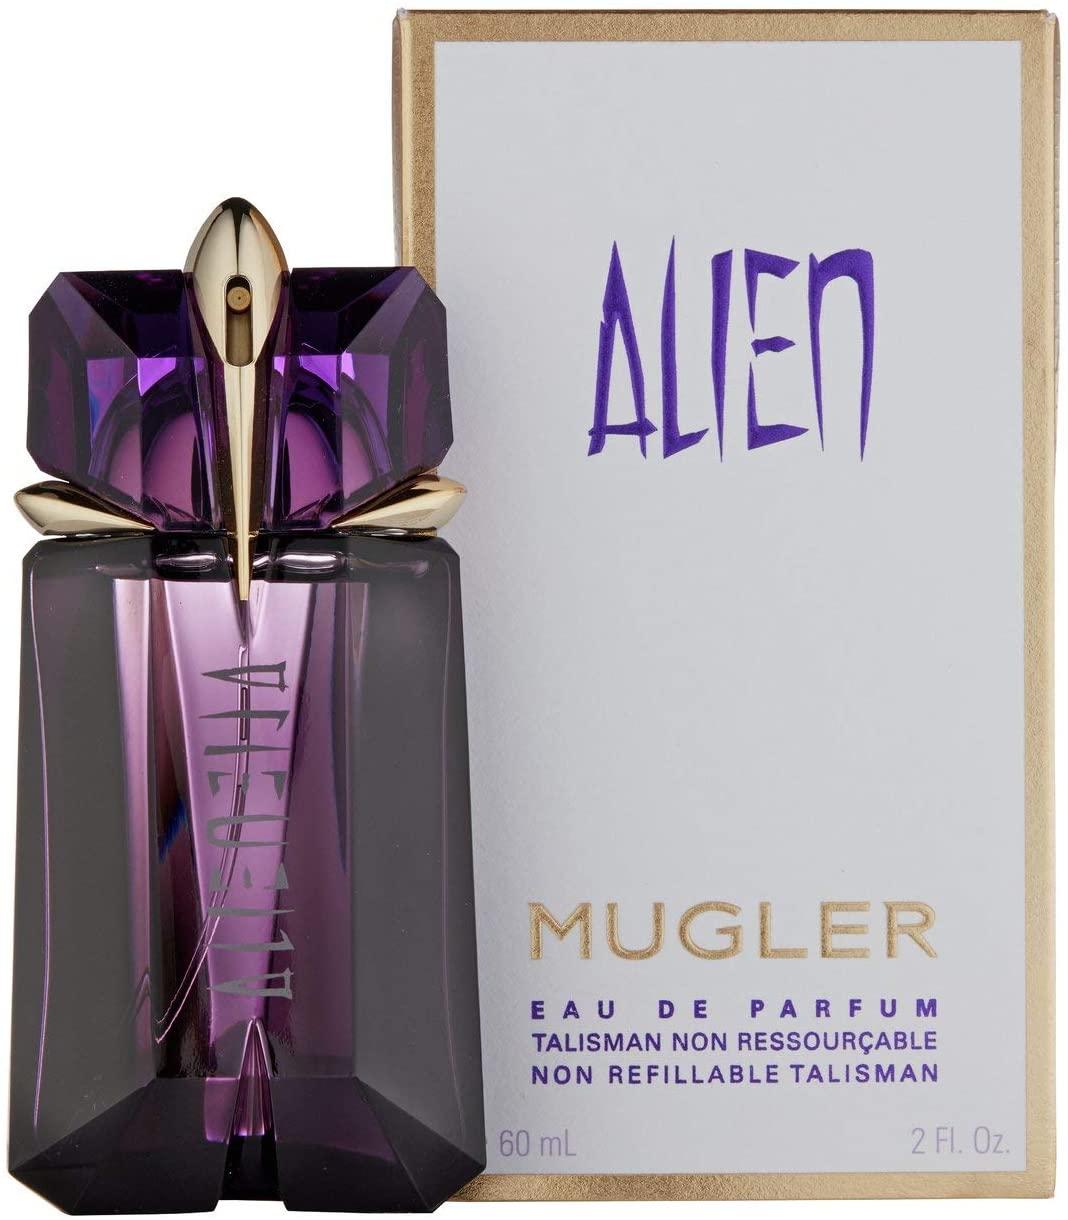 Thierry Mugler Alien - Perfumes For Women (60 ml, Eau de Parfum)